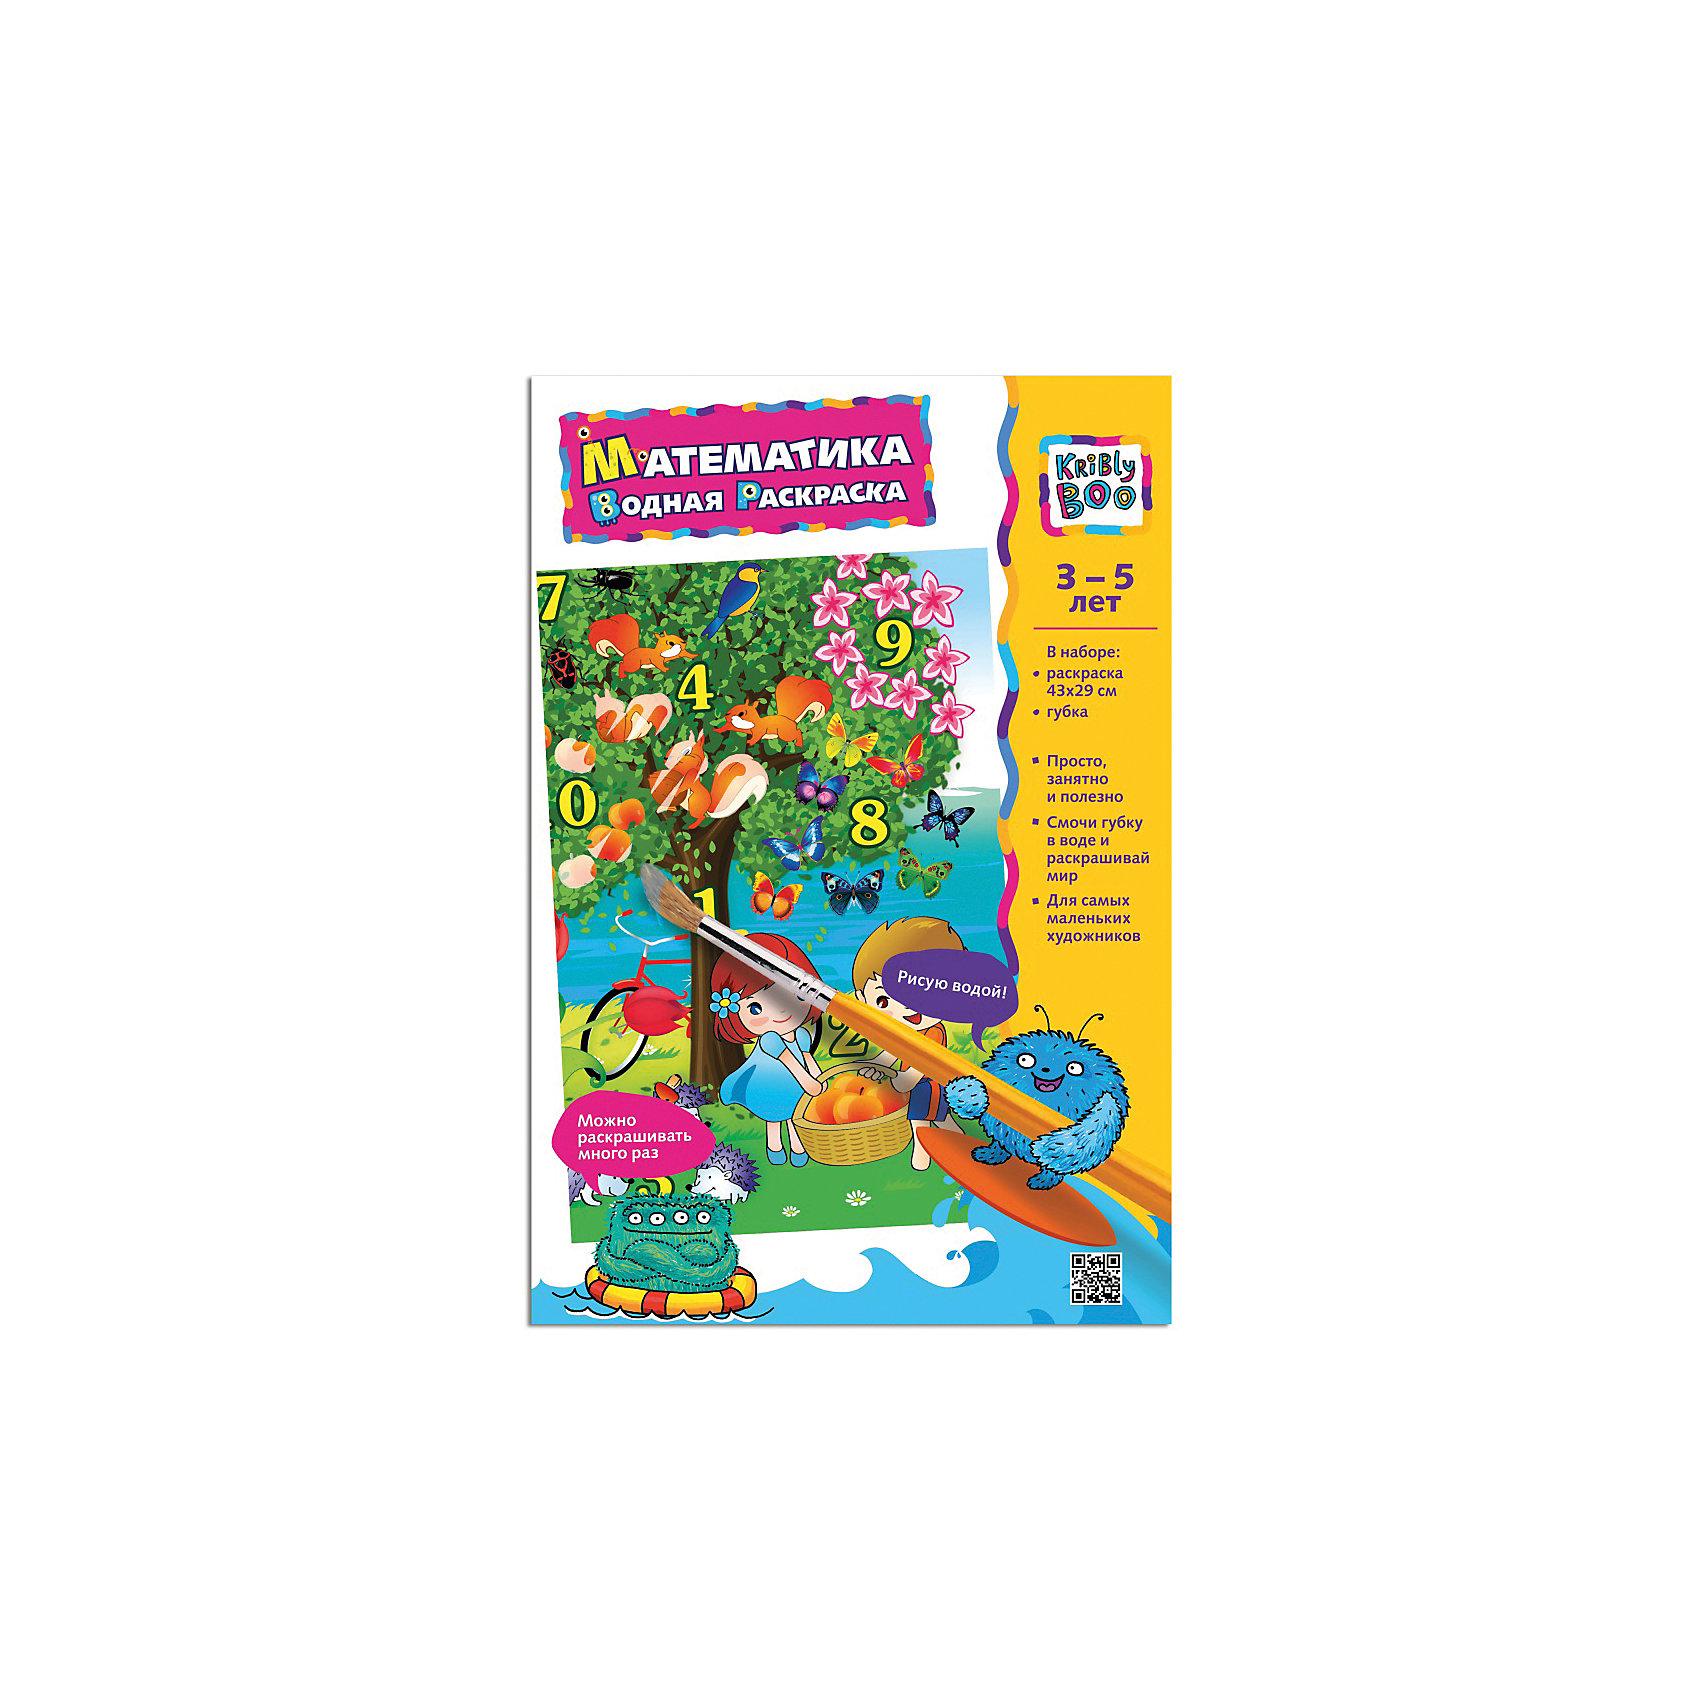 Kribly Boo Водная раскраска Математика ювента математика для детей 3 4 лет